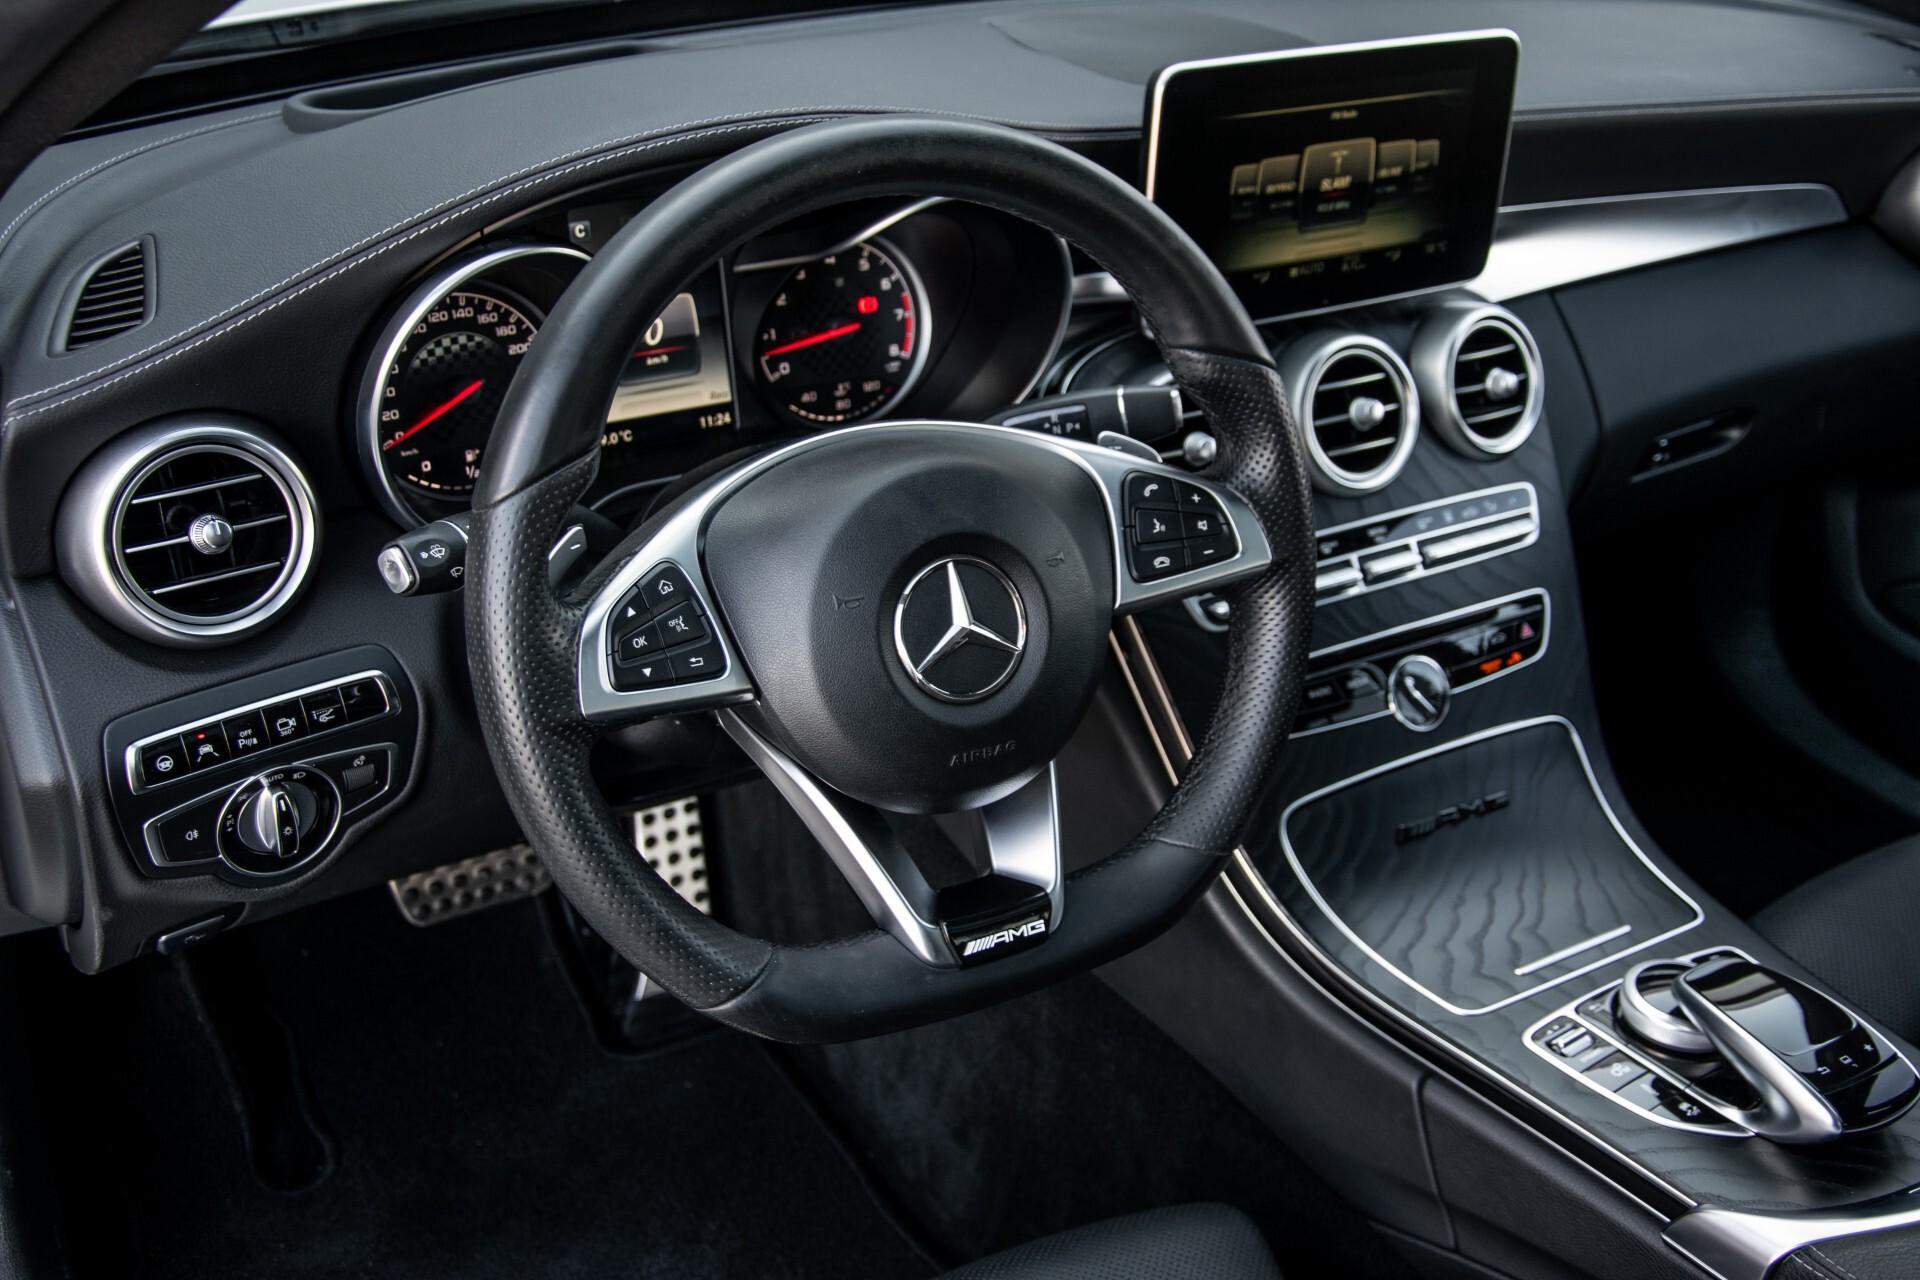 Mercedes-Benz C-Klasse 450/43 AMG 4-M Distronic/Standkachel/Panorama/Keyless/Harman-Kardon/Stoelkoeling Aut7 Foto 16